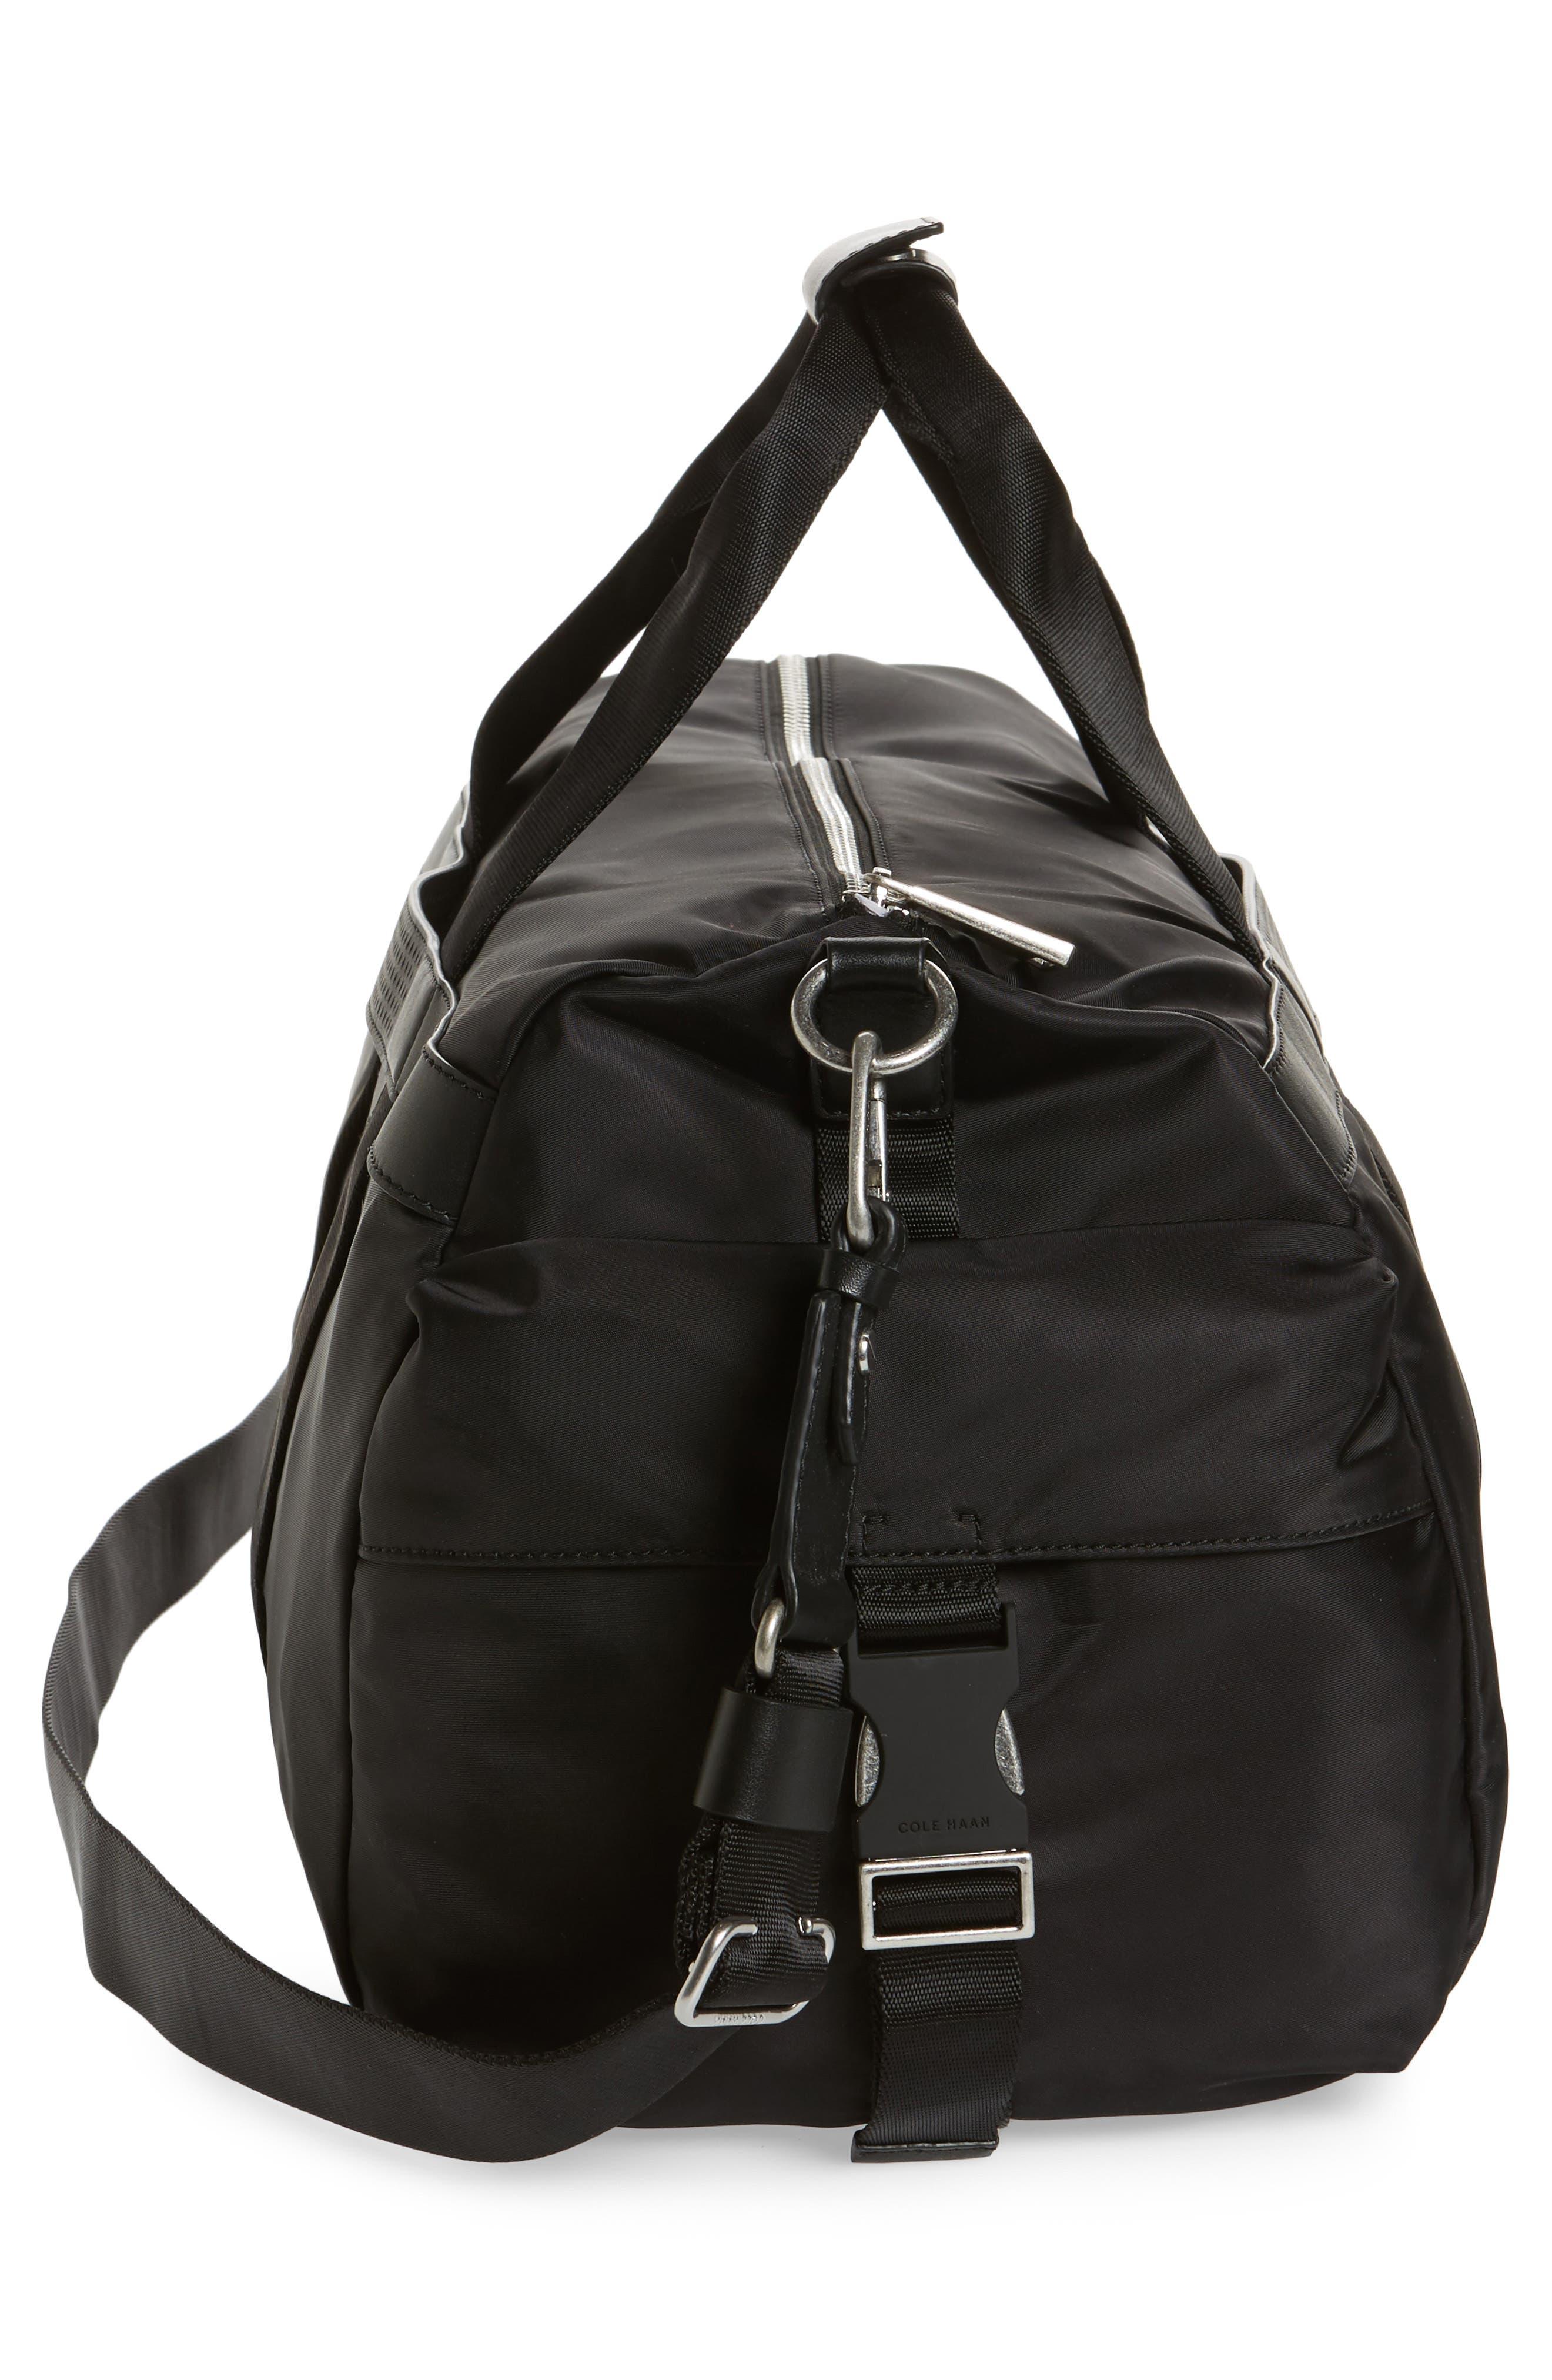 Washington Grand City Duffel Bag,                             Alternate thumbnail 5, color,                             Black